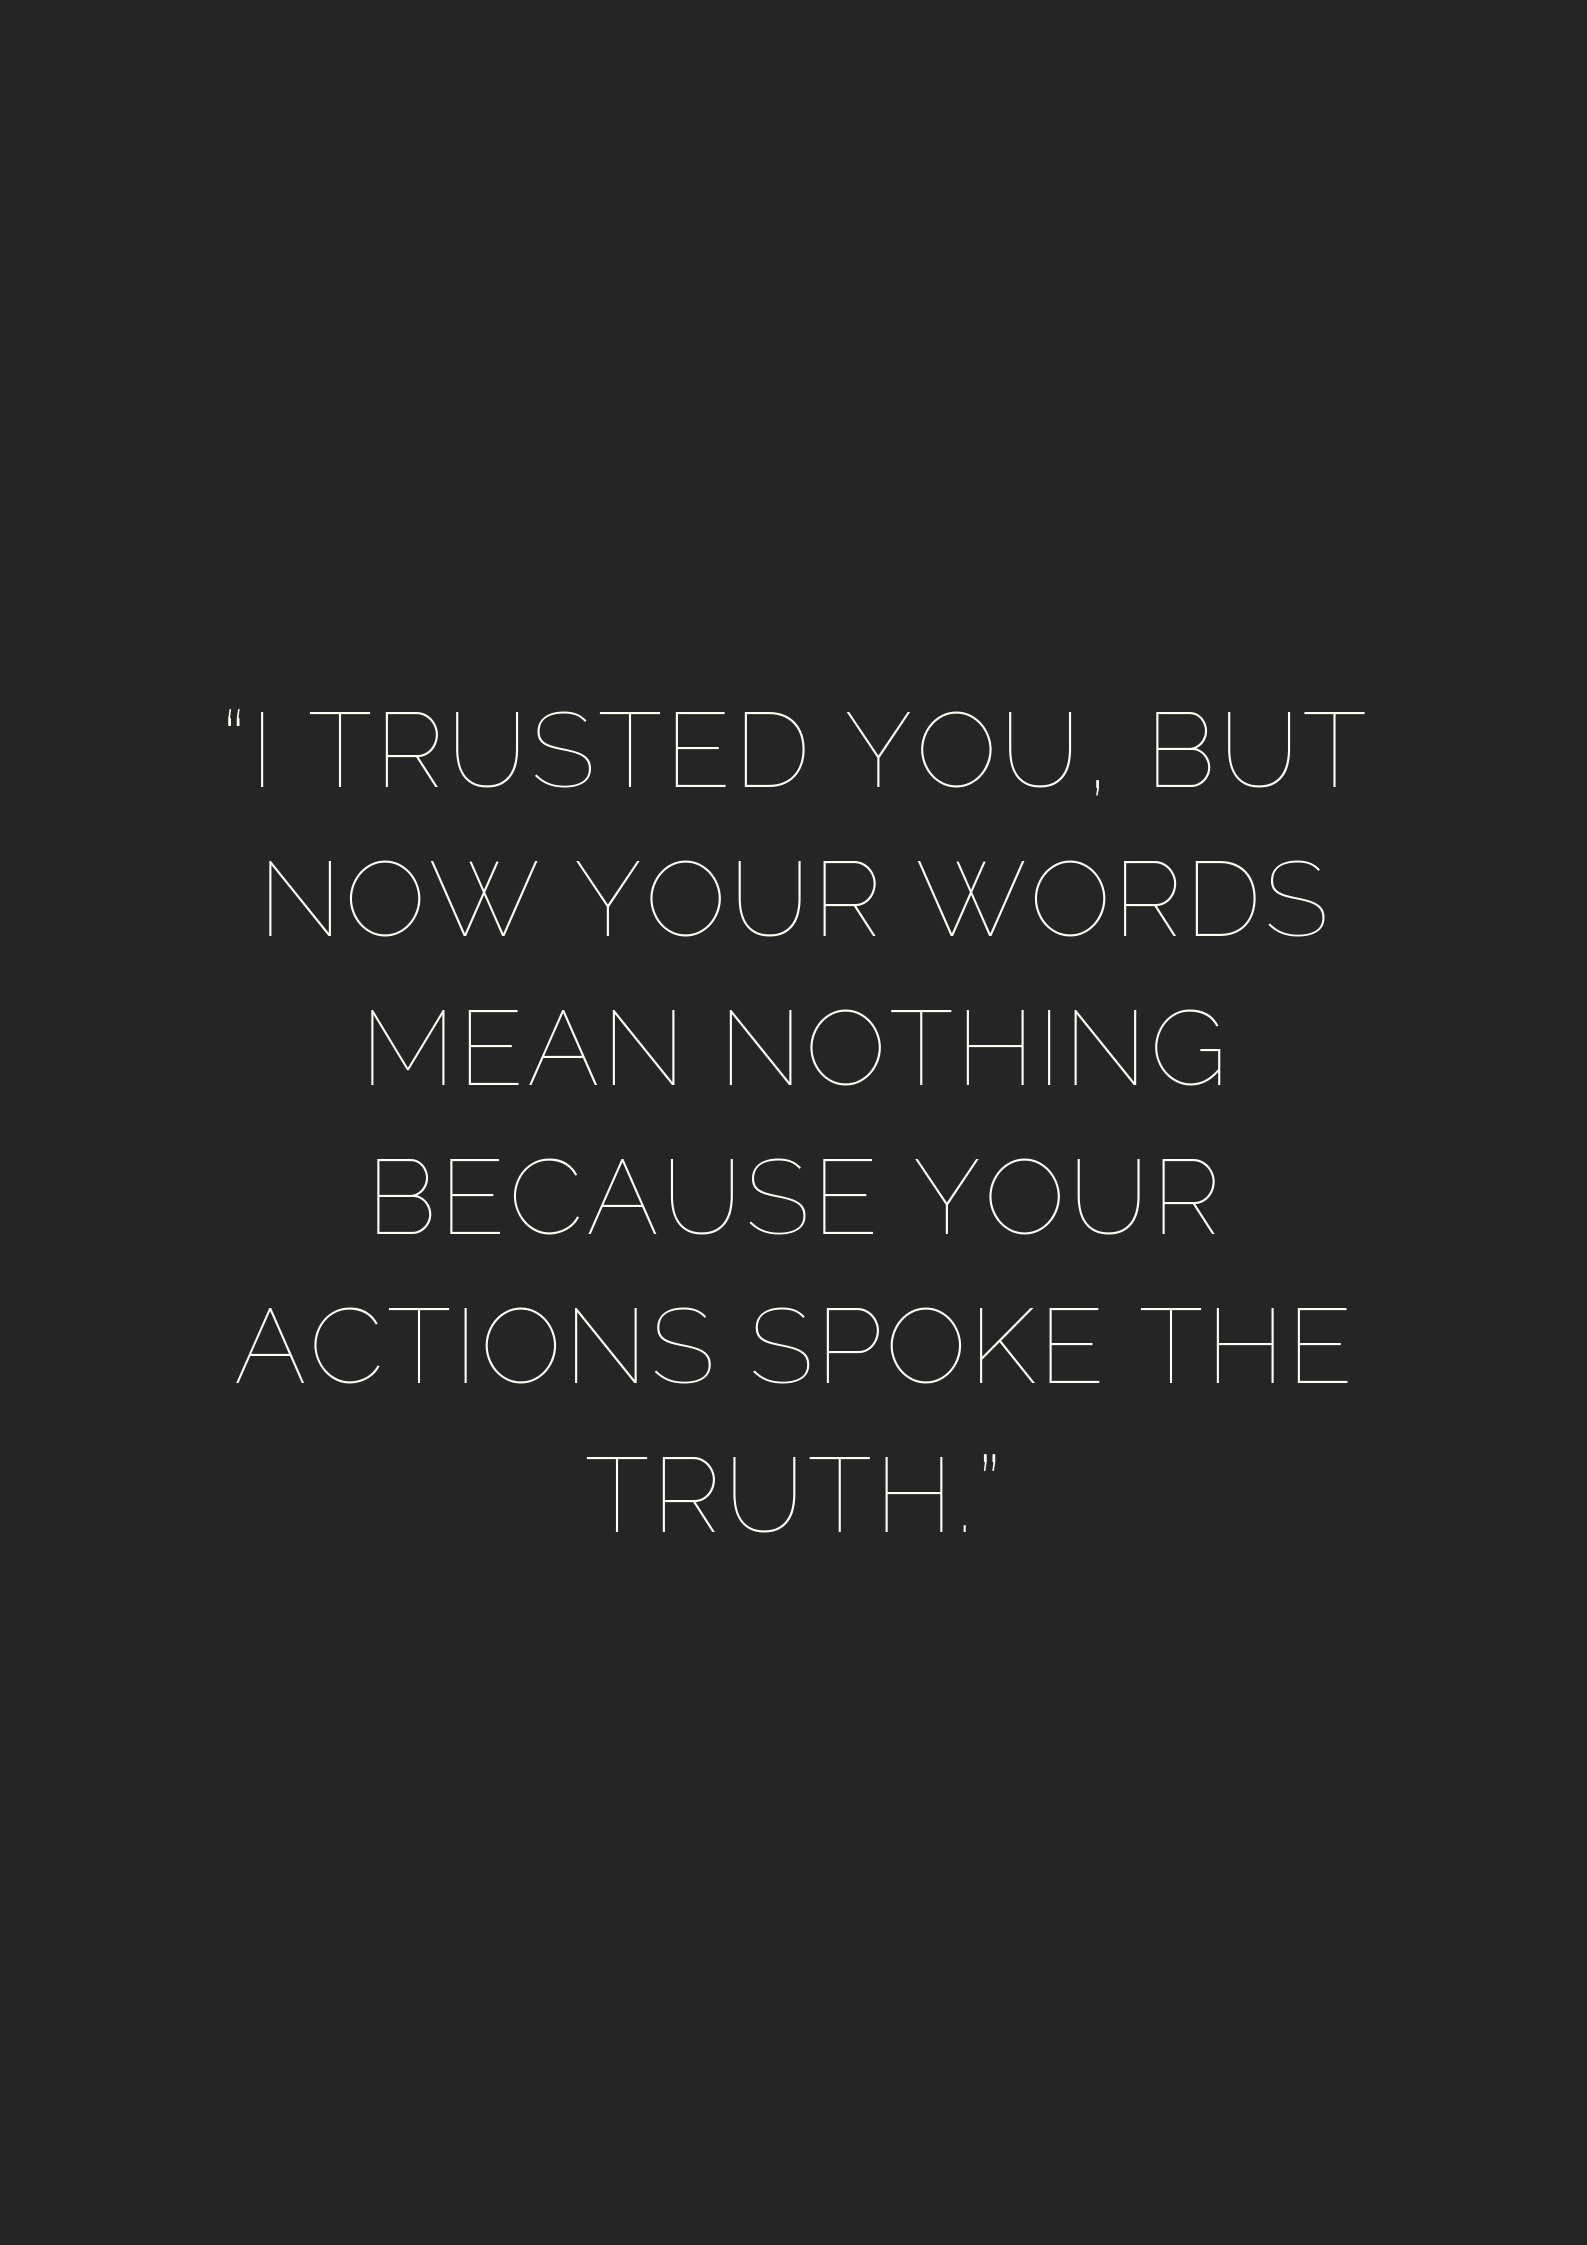 Betrayal Quotes Betrayal Quotes Relationship Quotes Broken Broken Quotes For Him